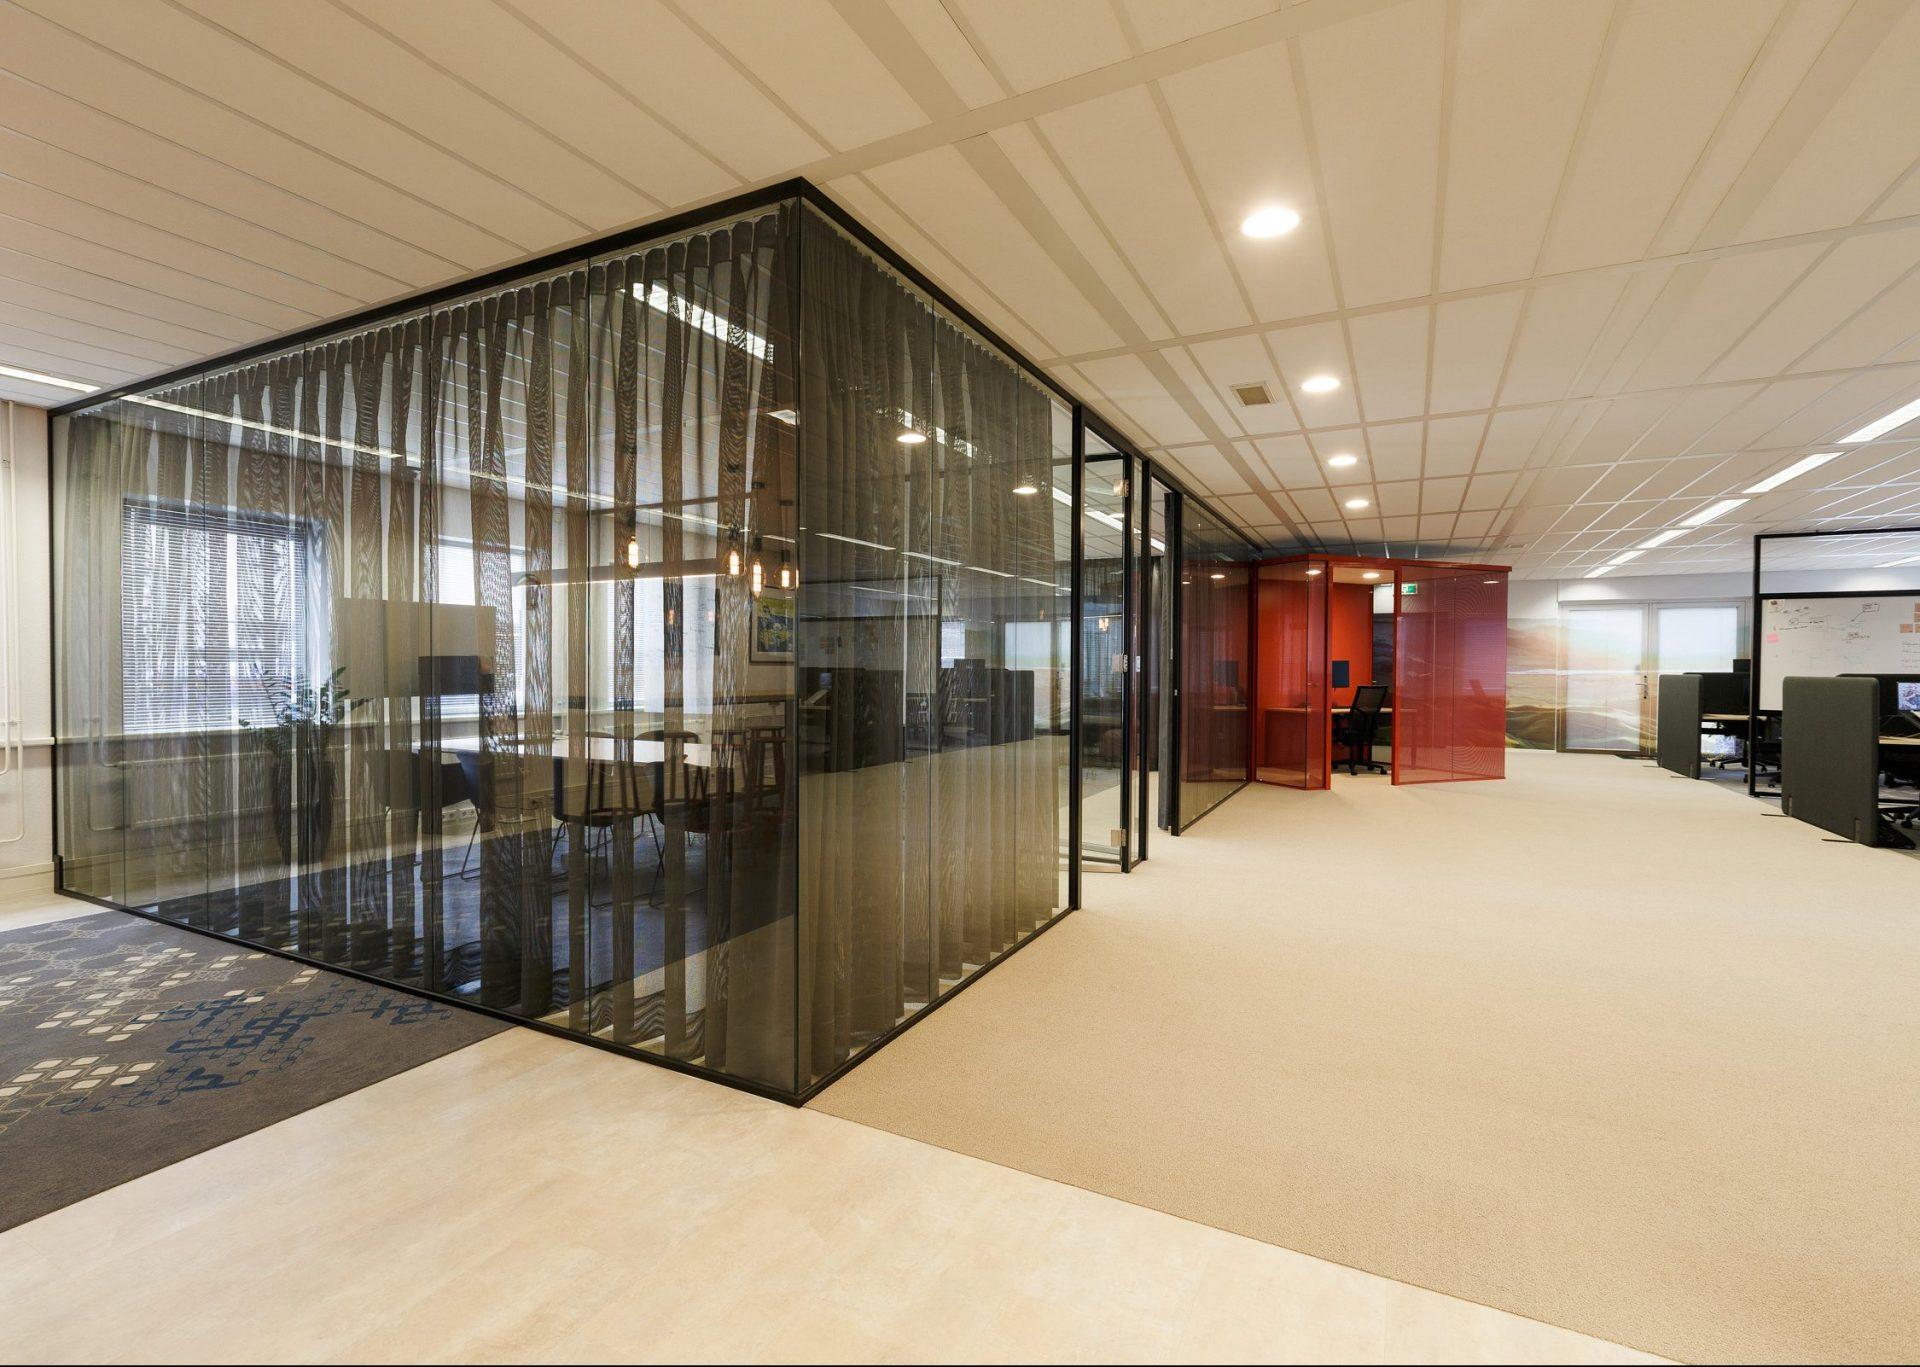 RubiX s-Hertogenbosch - Topperprojecten 7